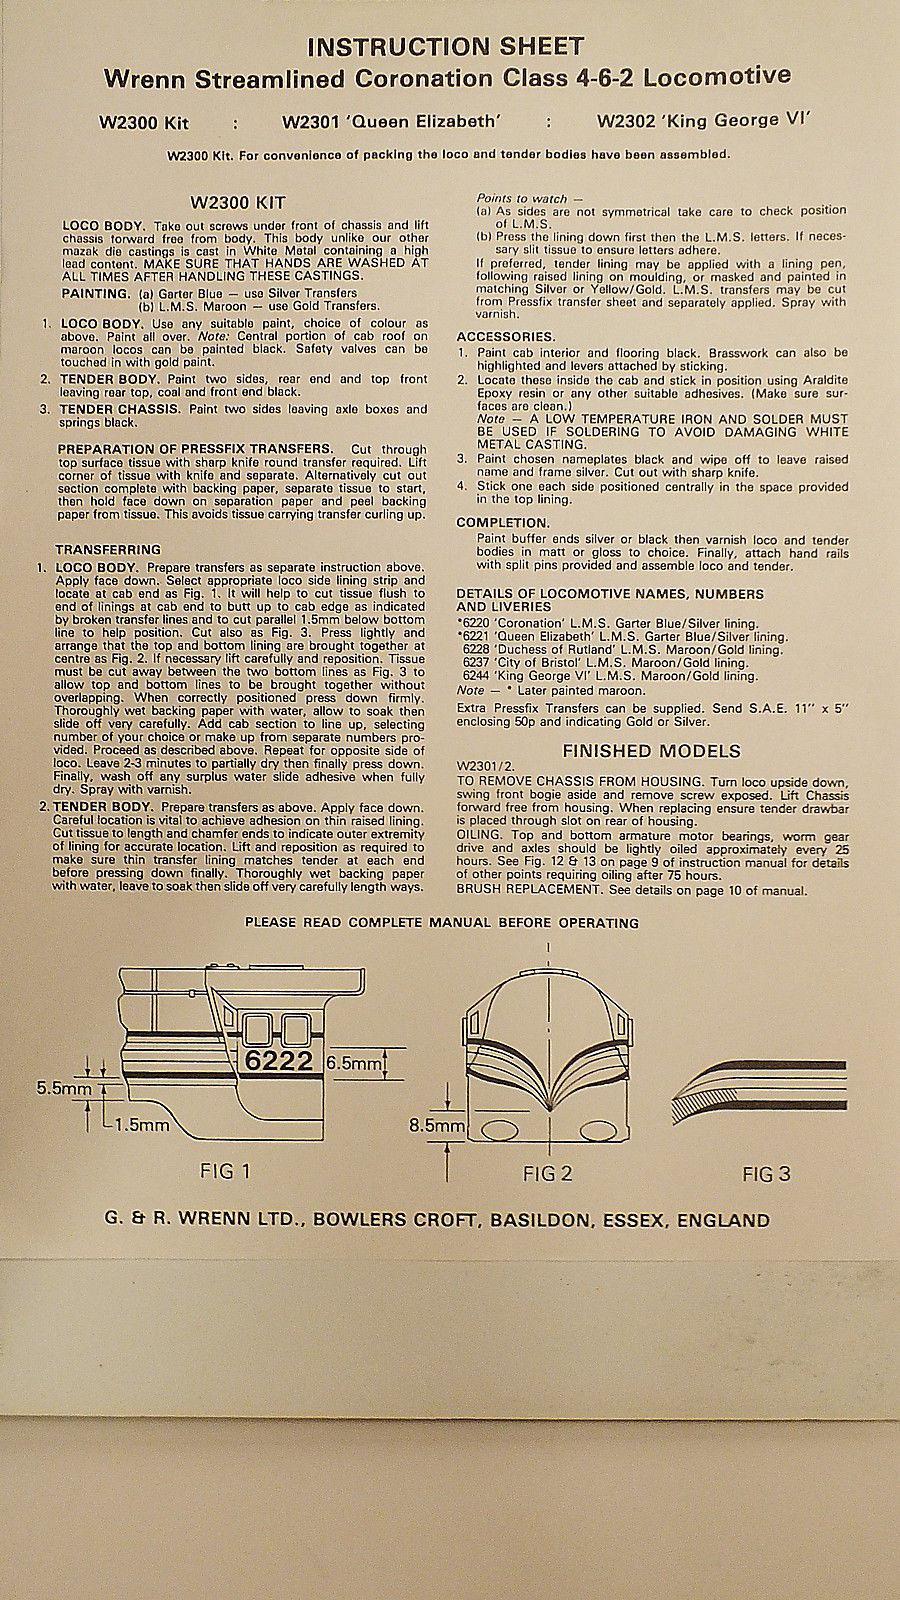 MS116 WRENN DUBLO INSTRUCTION LEAFLET ORIGINAL STREAMLINE CORONATION  TOM